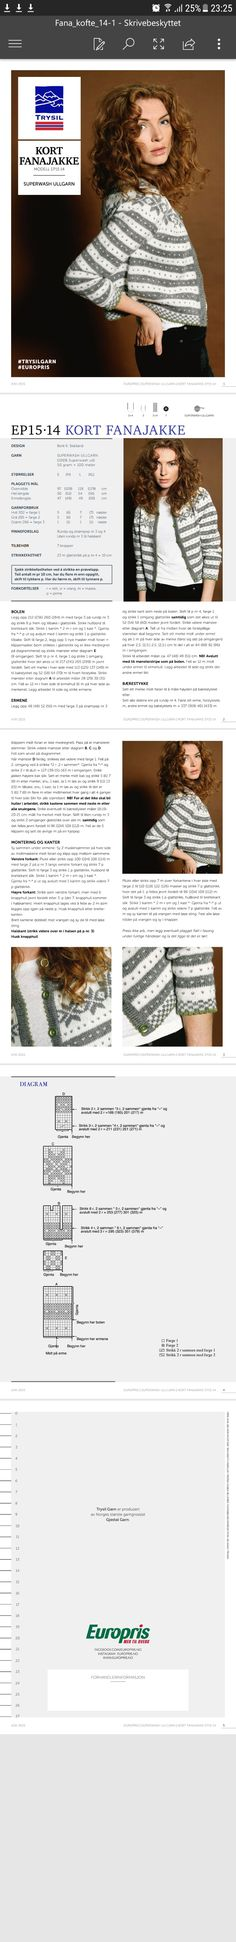 Pdf, Knitting, Tricot, Breien, Stricken, Weaving, Knits, Crocheting, Yarns